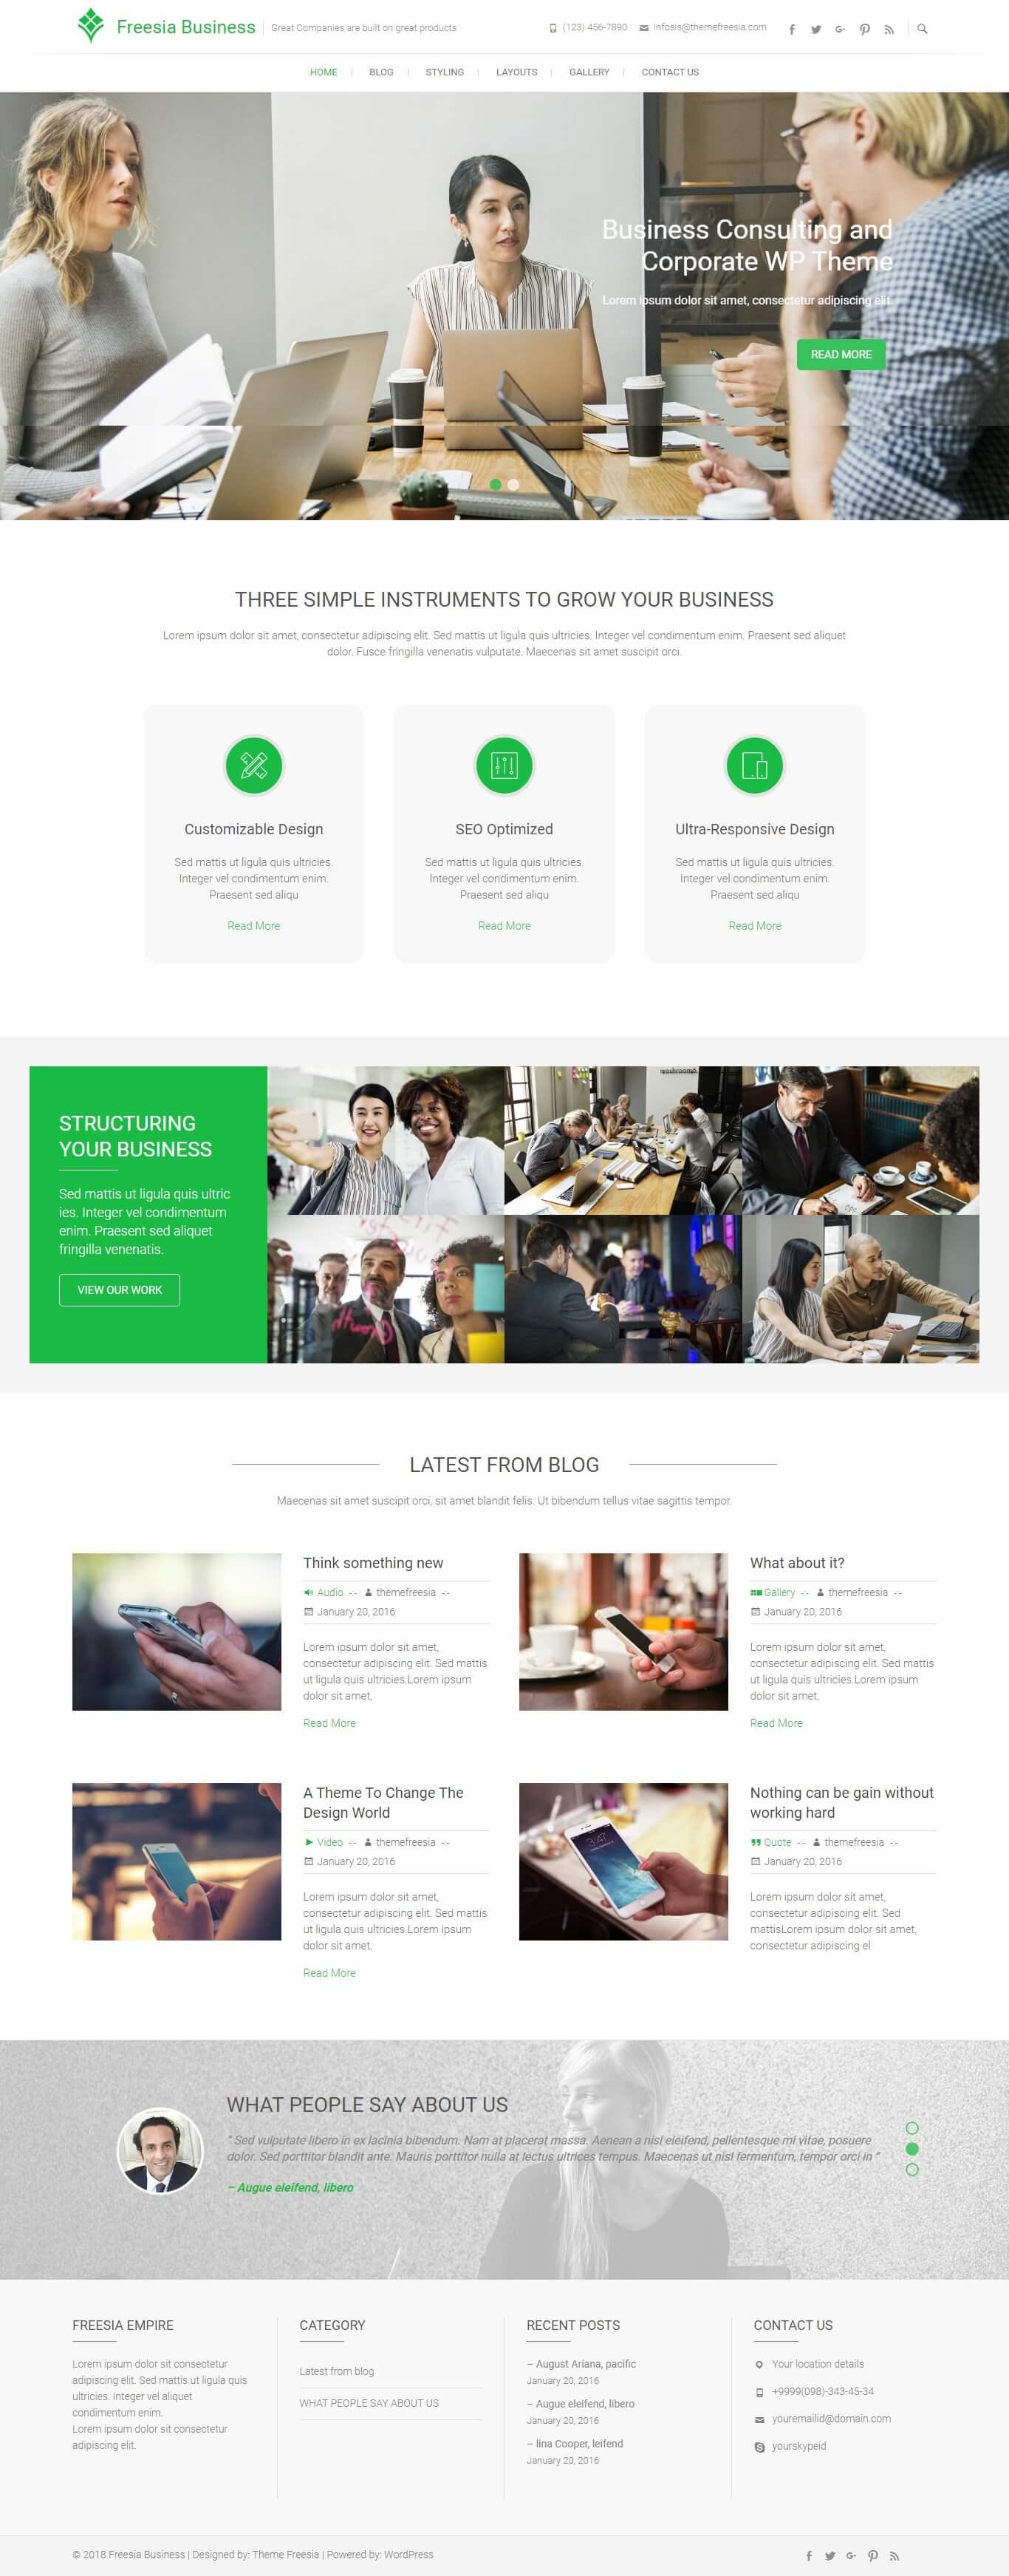 Freesia Business